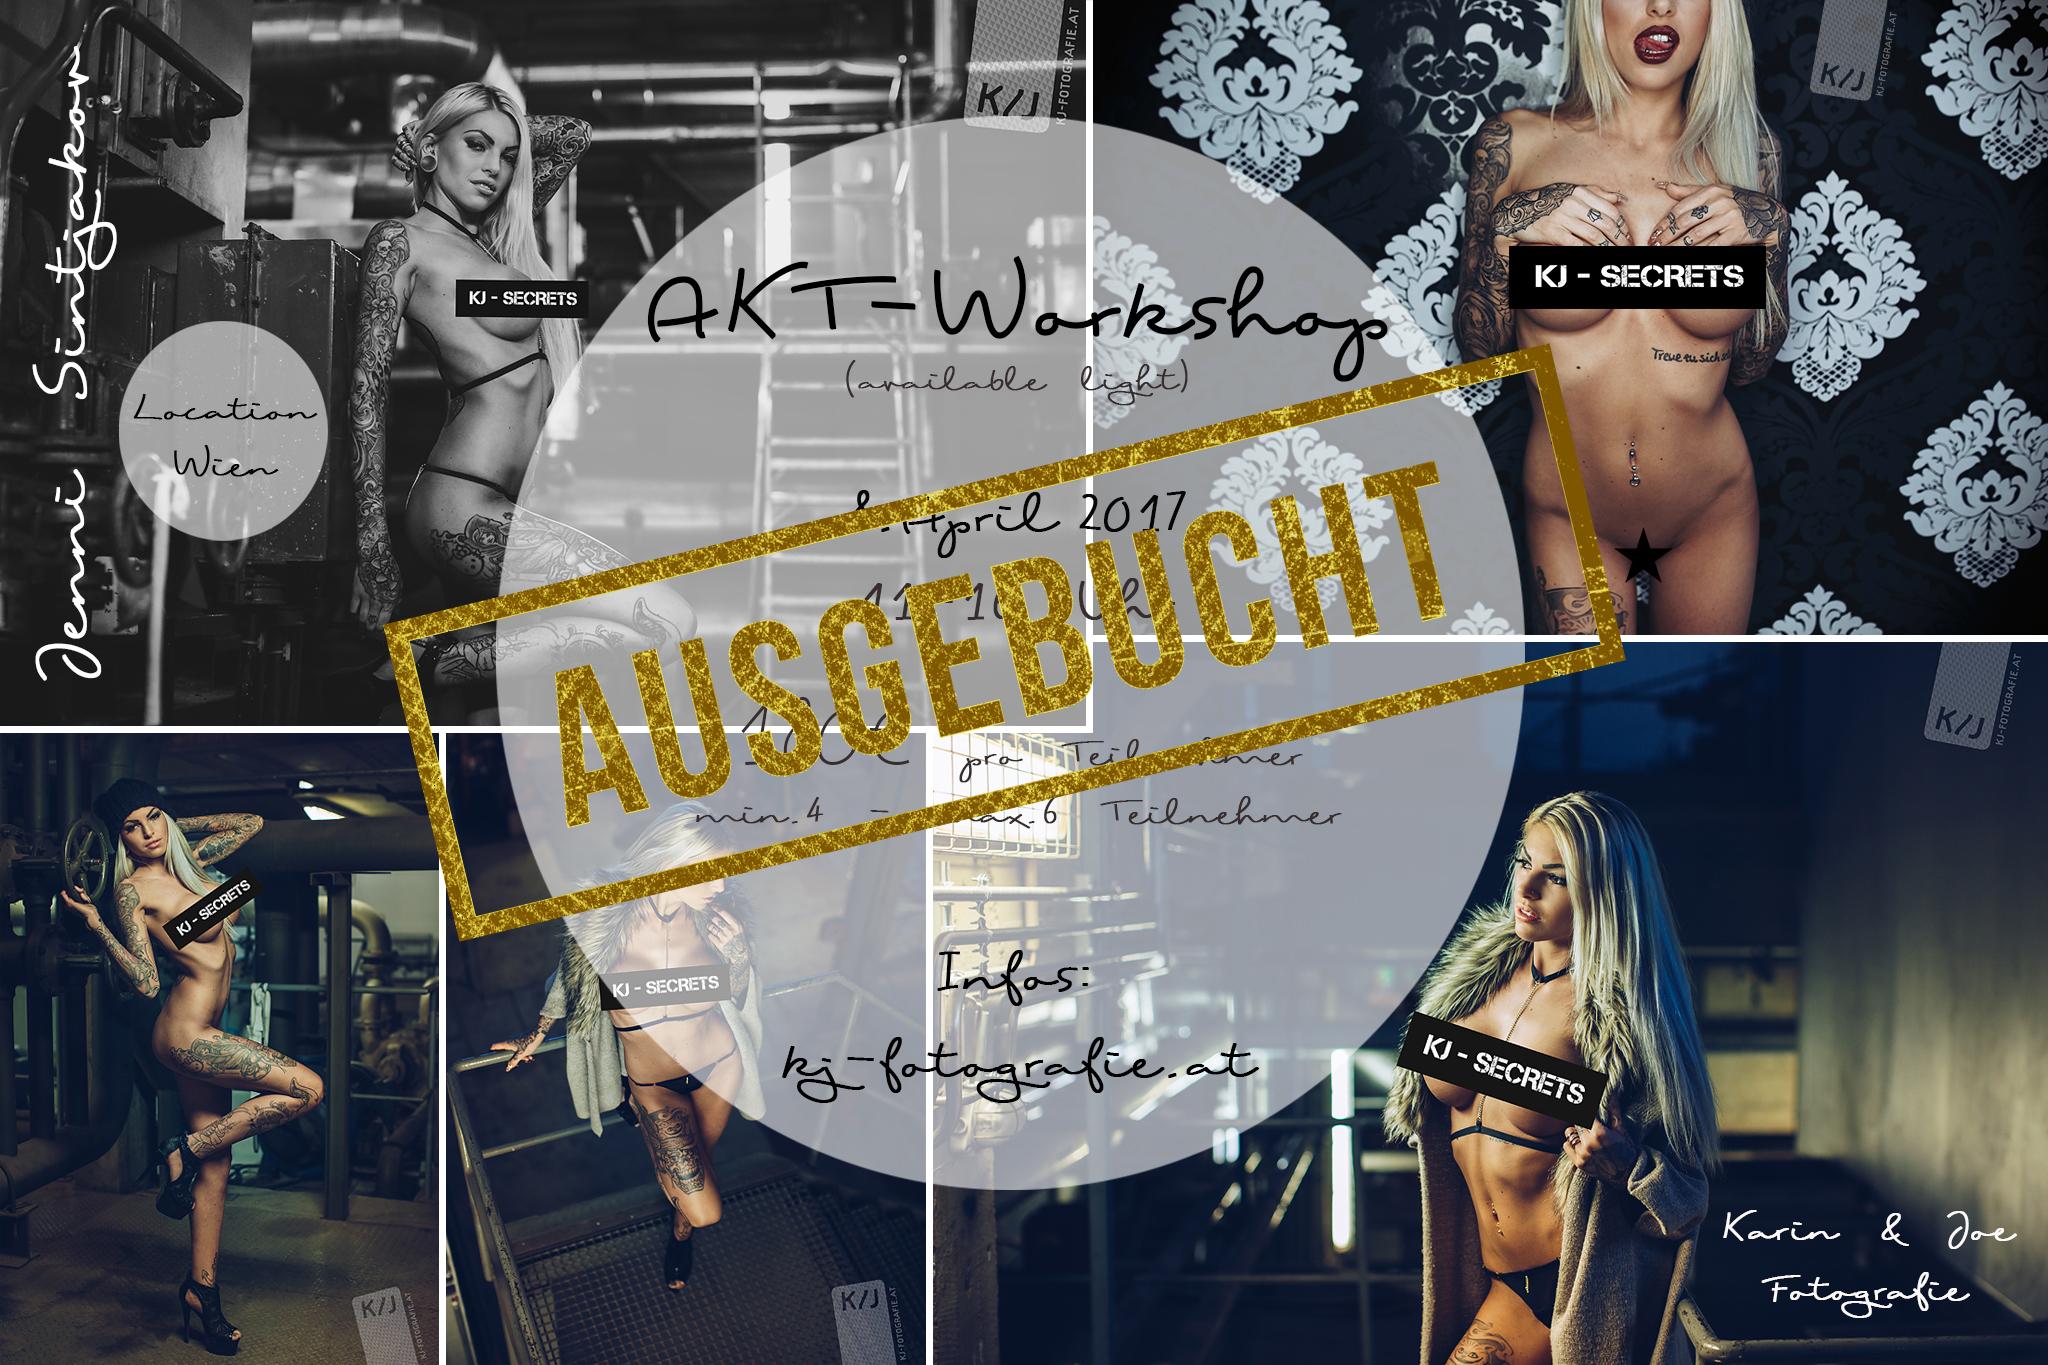 AKT_Workshop_JenniFbausgebucht